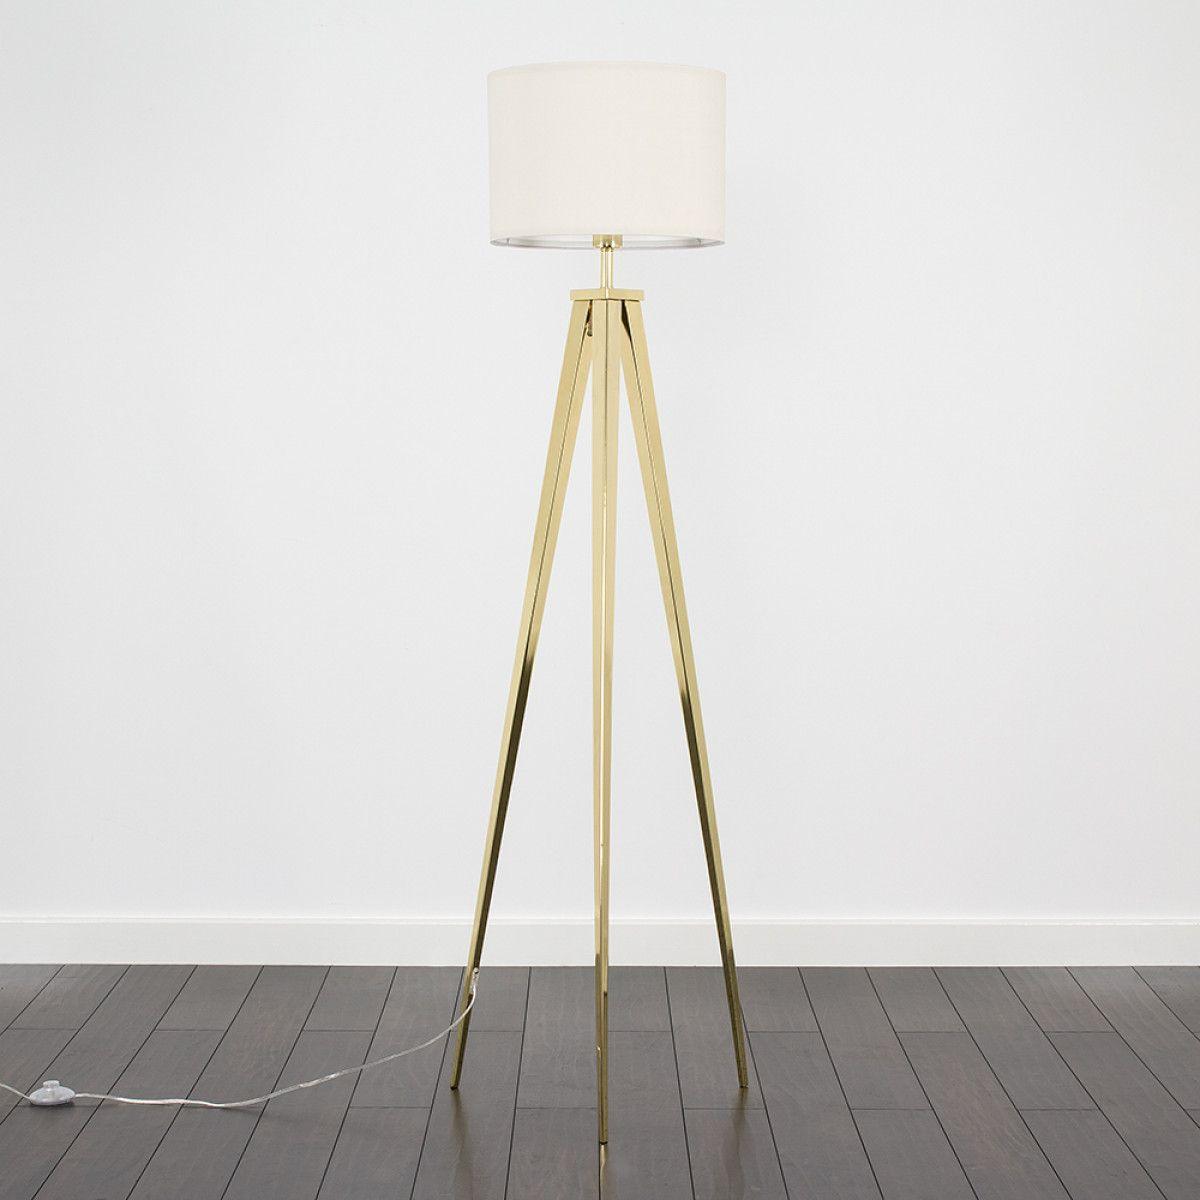 Nero Gold Tripod Floor Lamp Cream Shade   Gold tripod